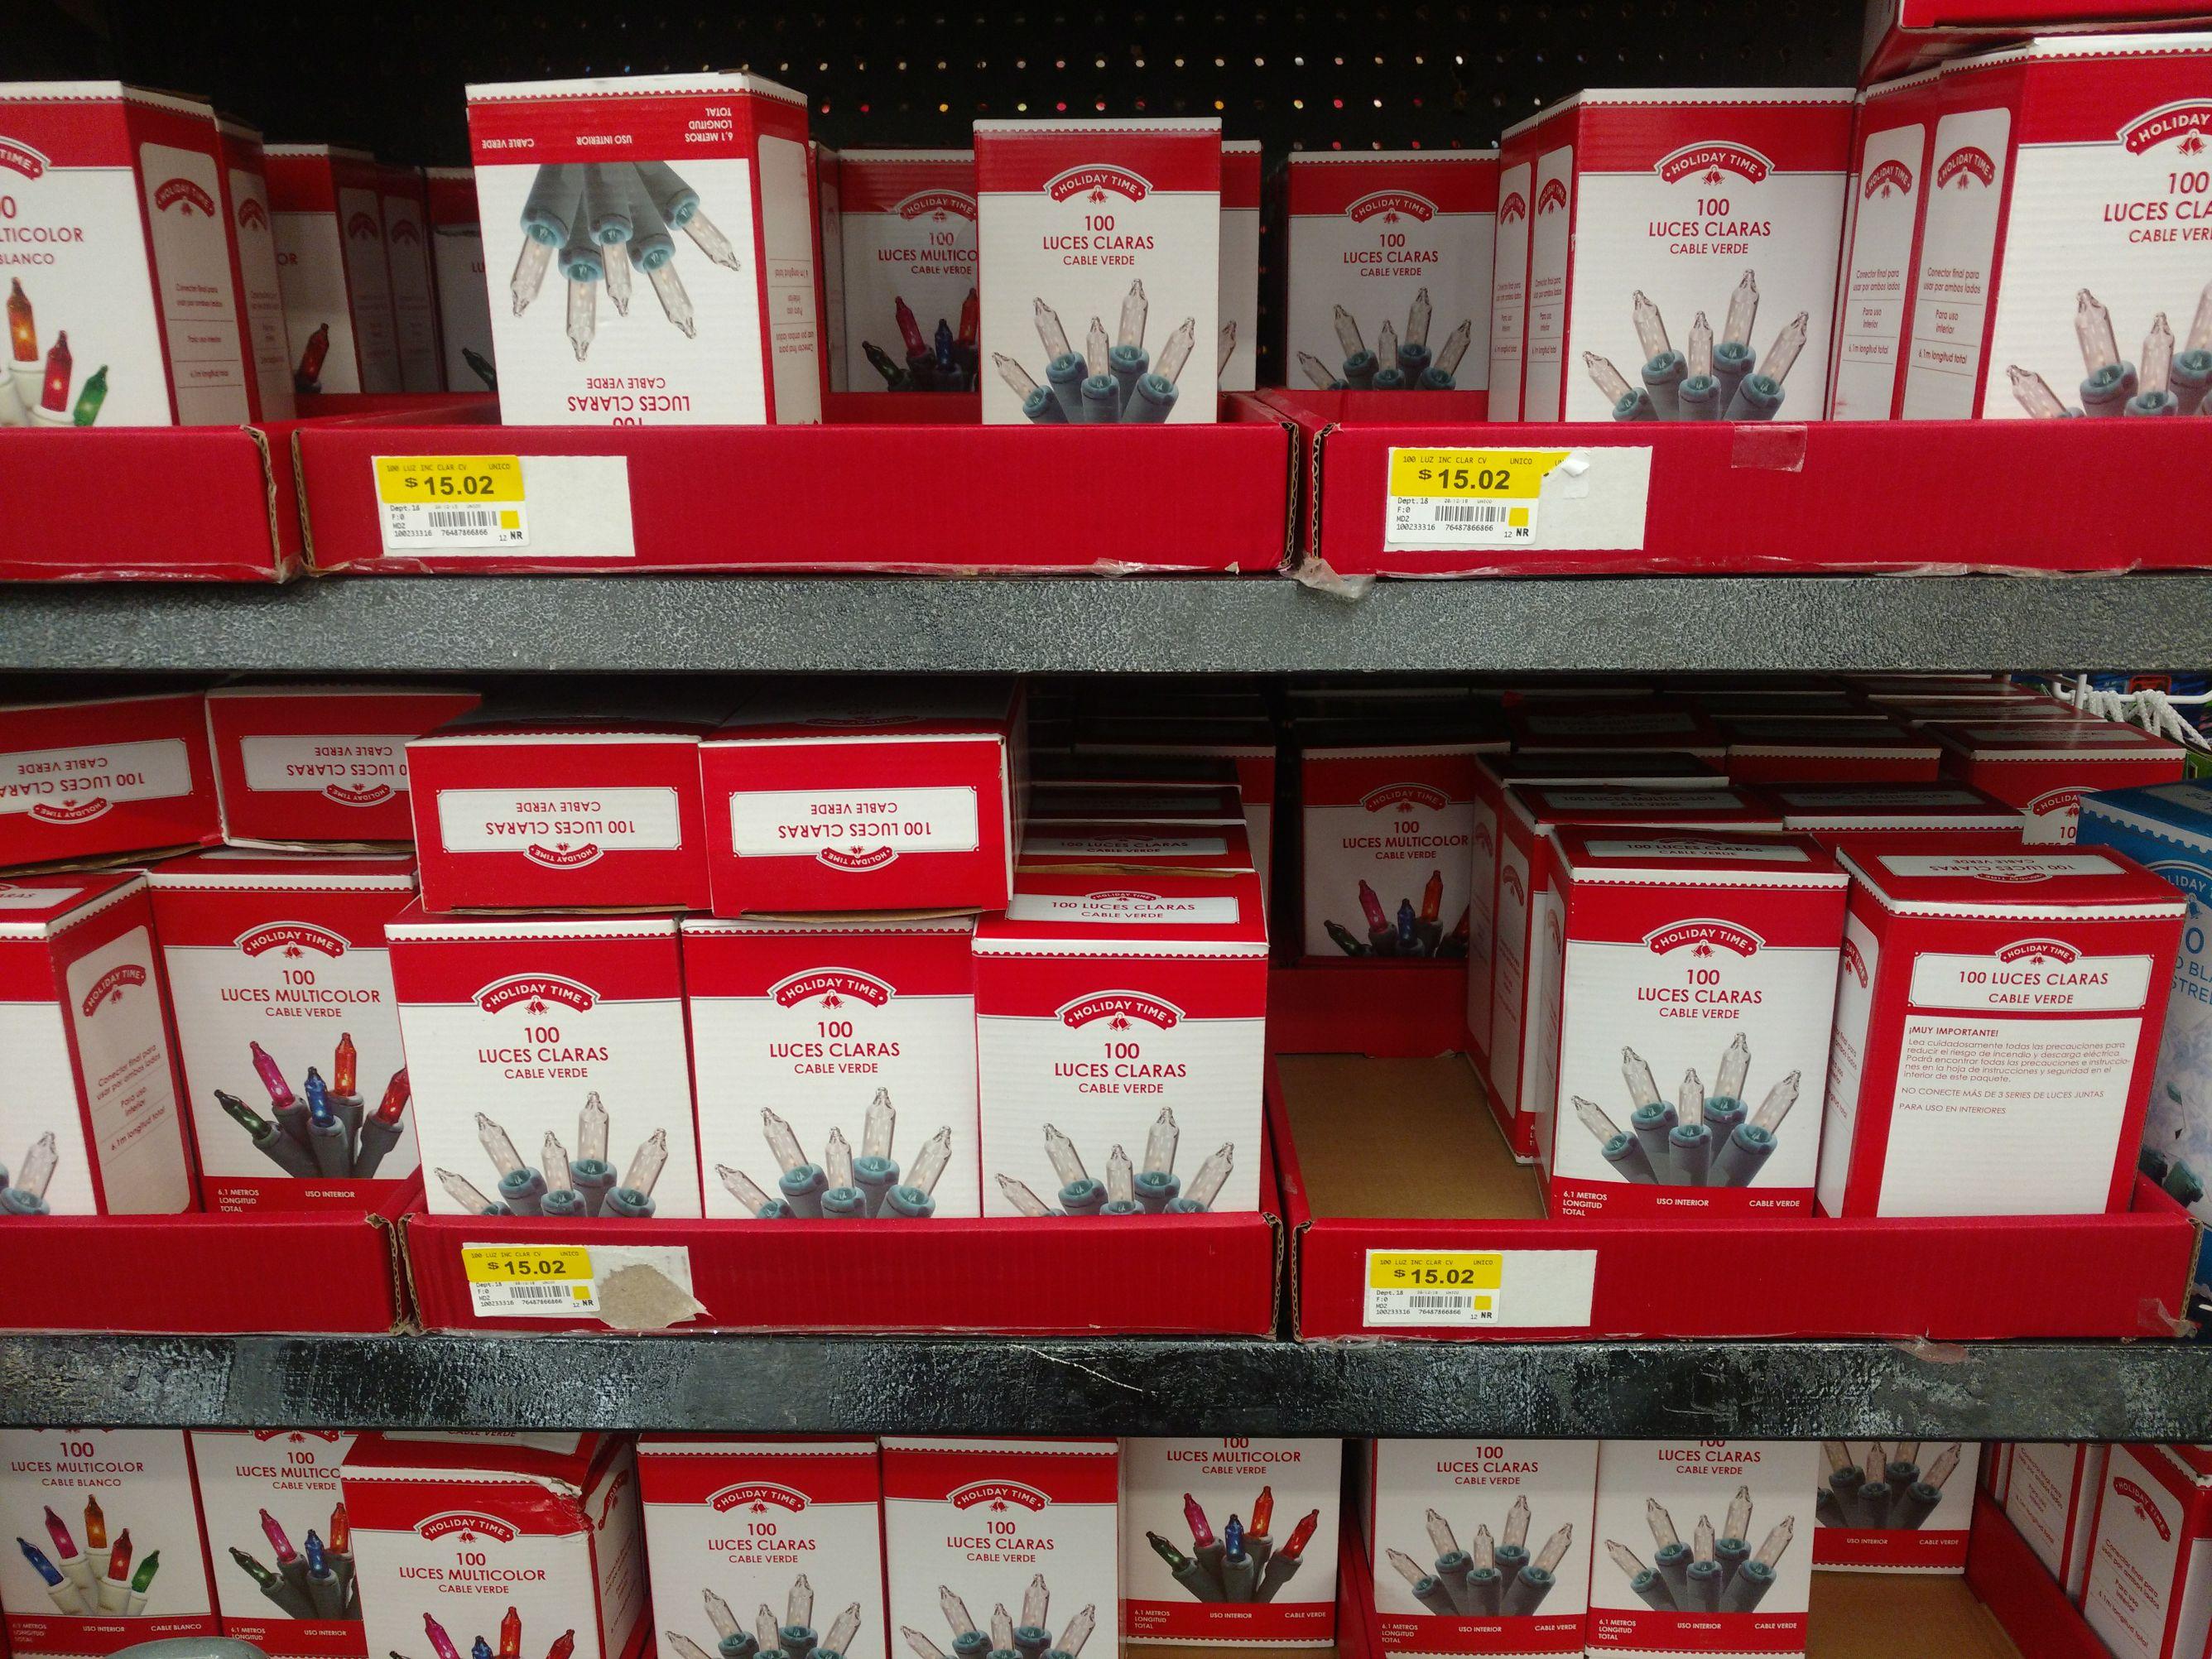 Walmart: Variedades de luces navideñas